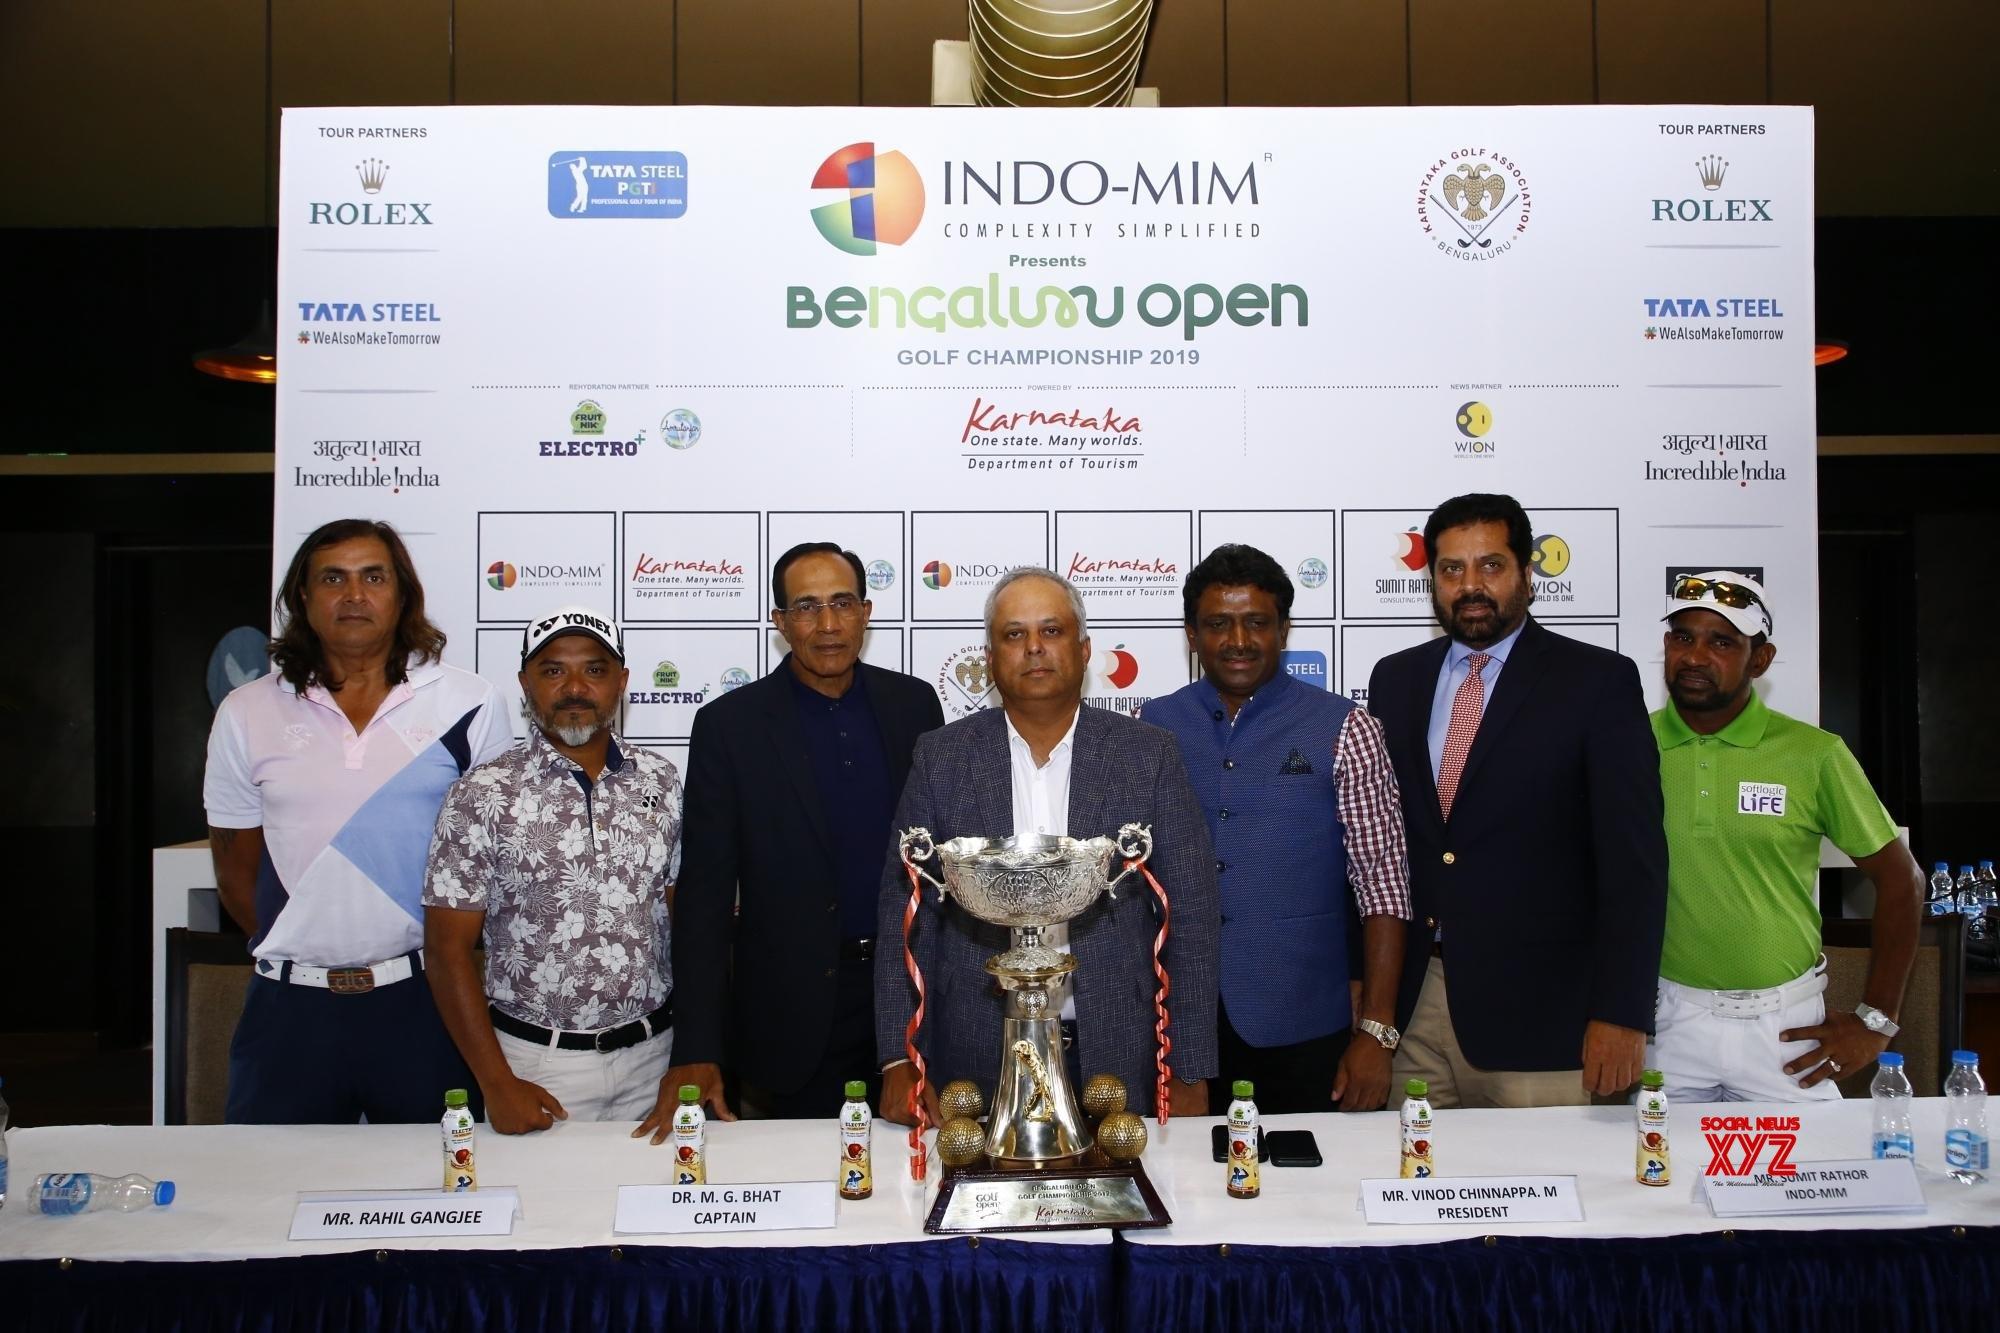 Bengaluru Open Golf C'ship 2019 from Dec 17